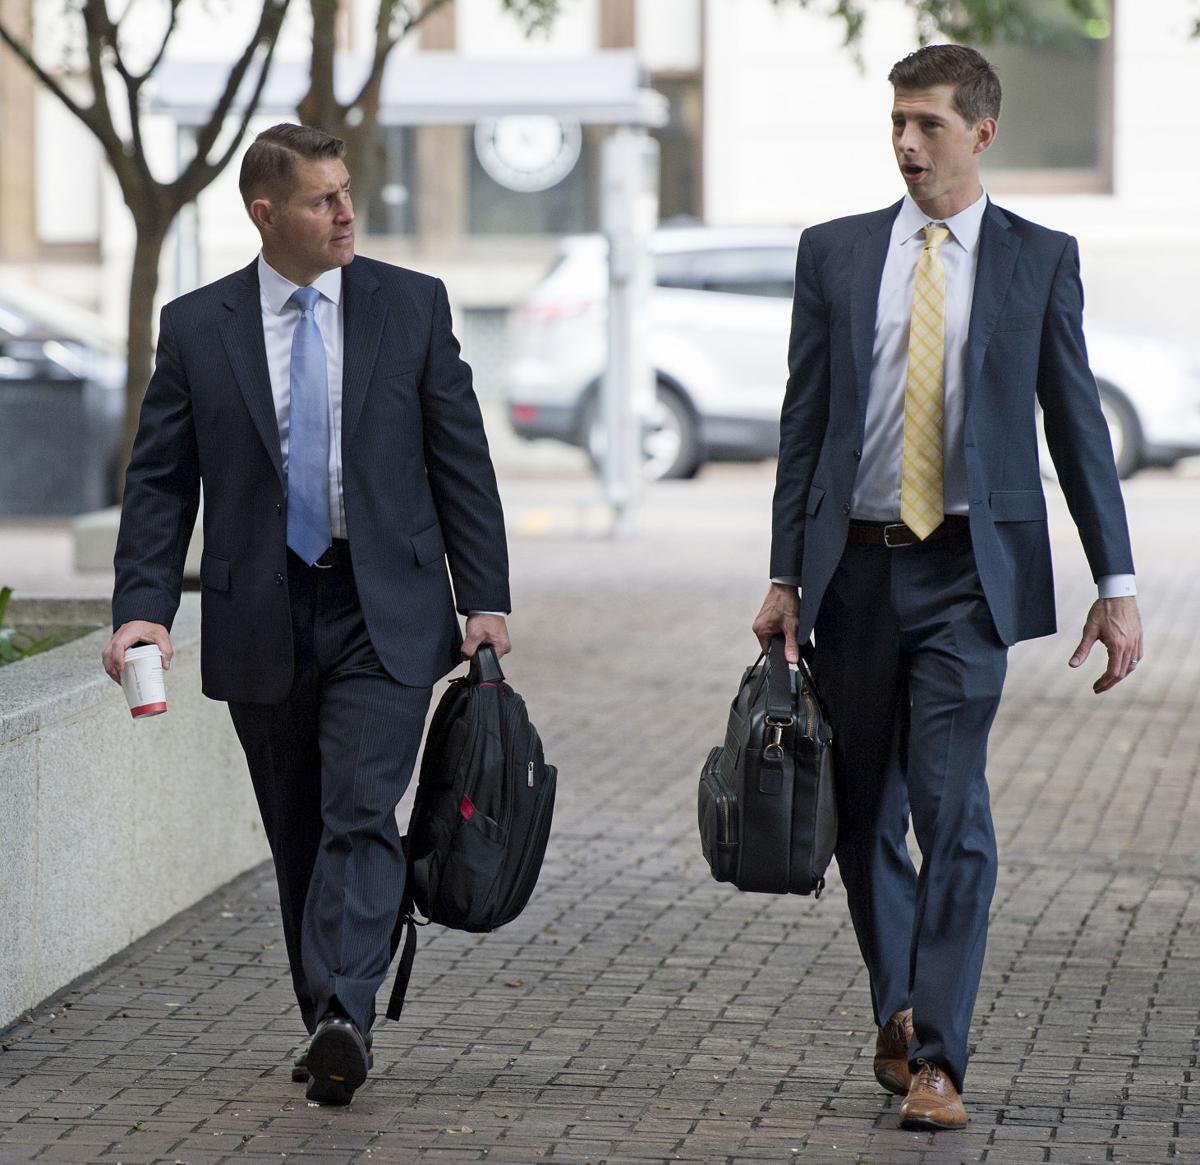 Chad Scott prosecutors